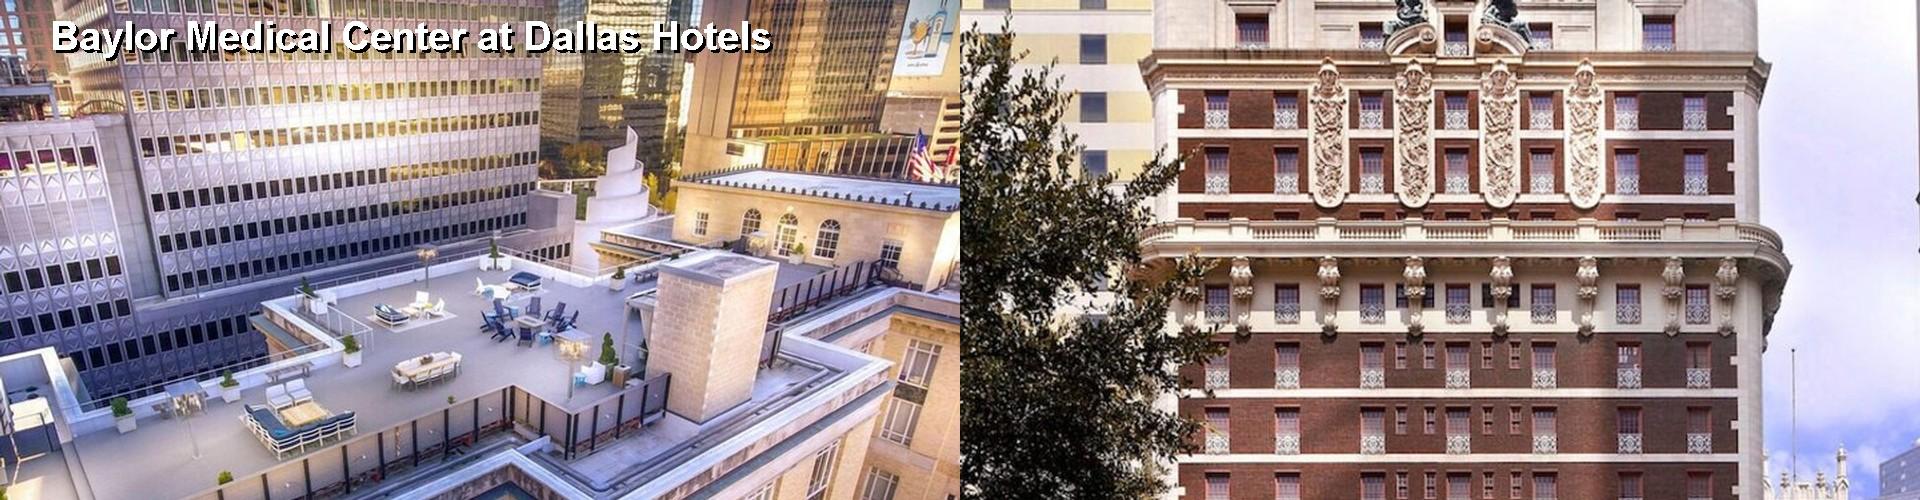 5 Best Hotels Near Baylor Medical Center At Dallas